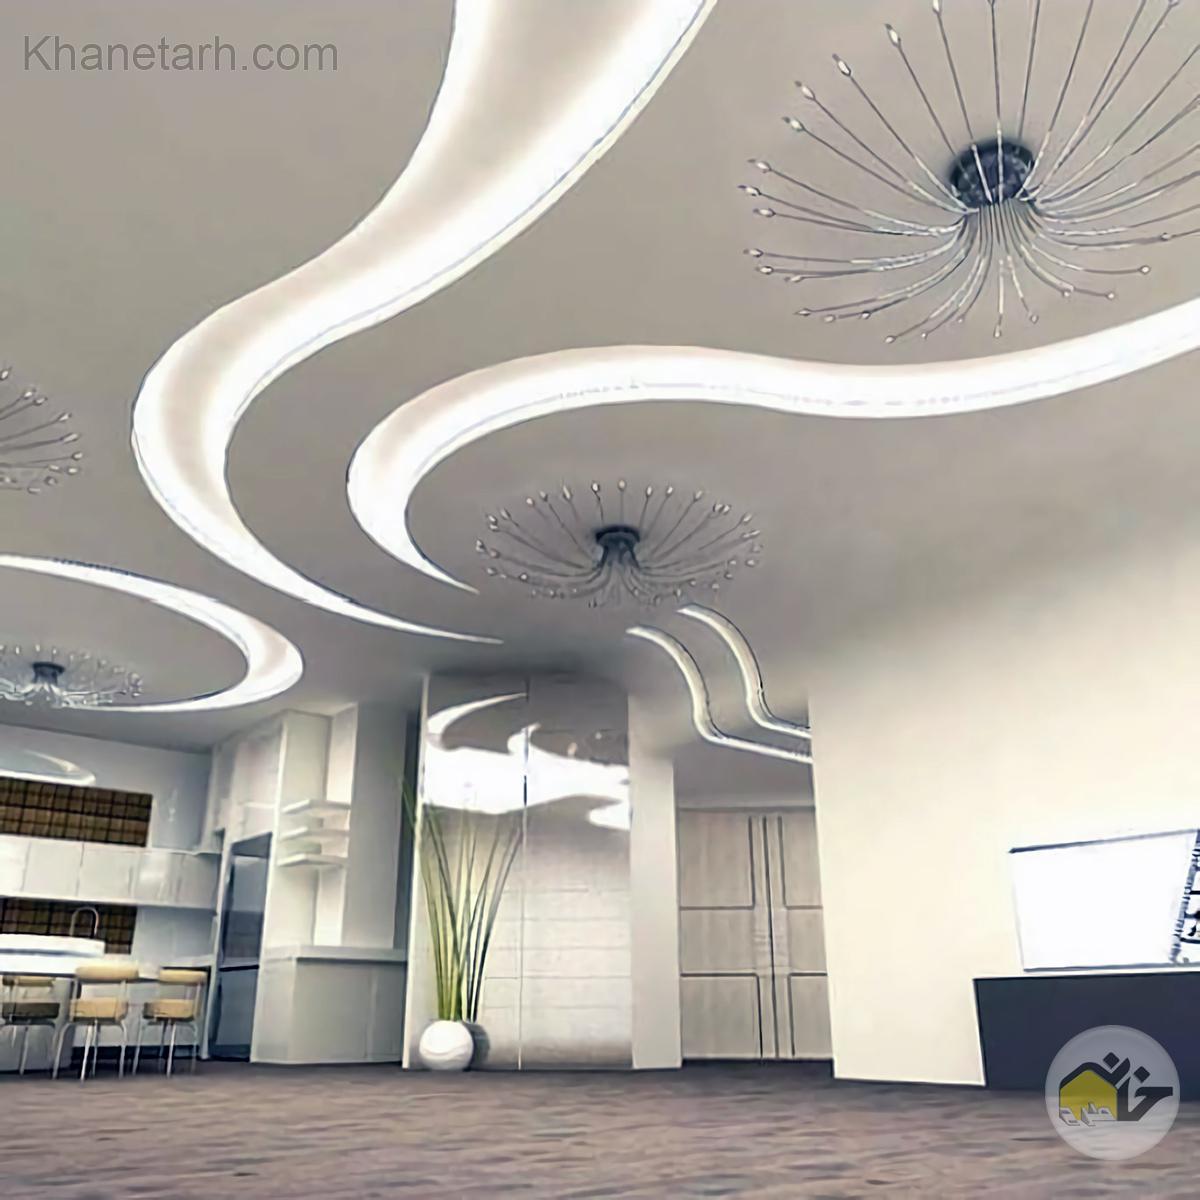 گچبری نور مخفی سقف